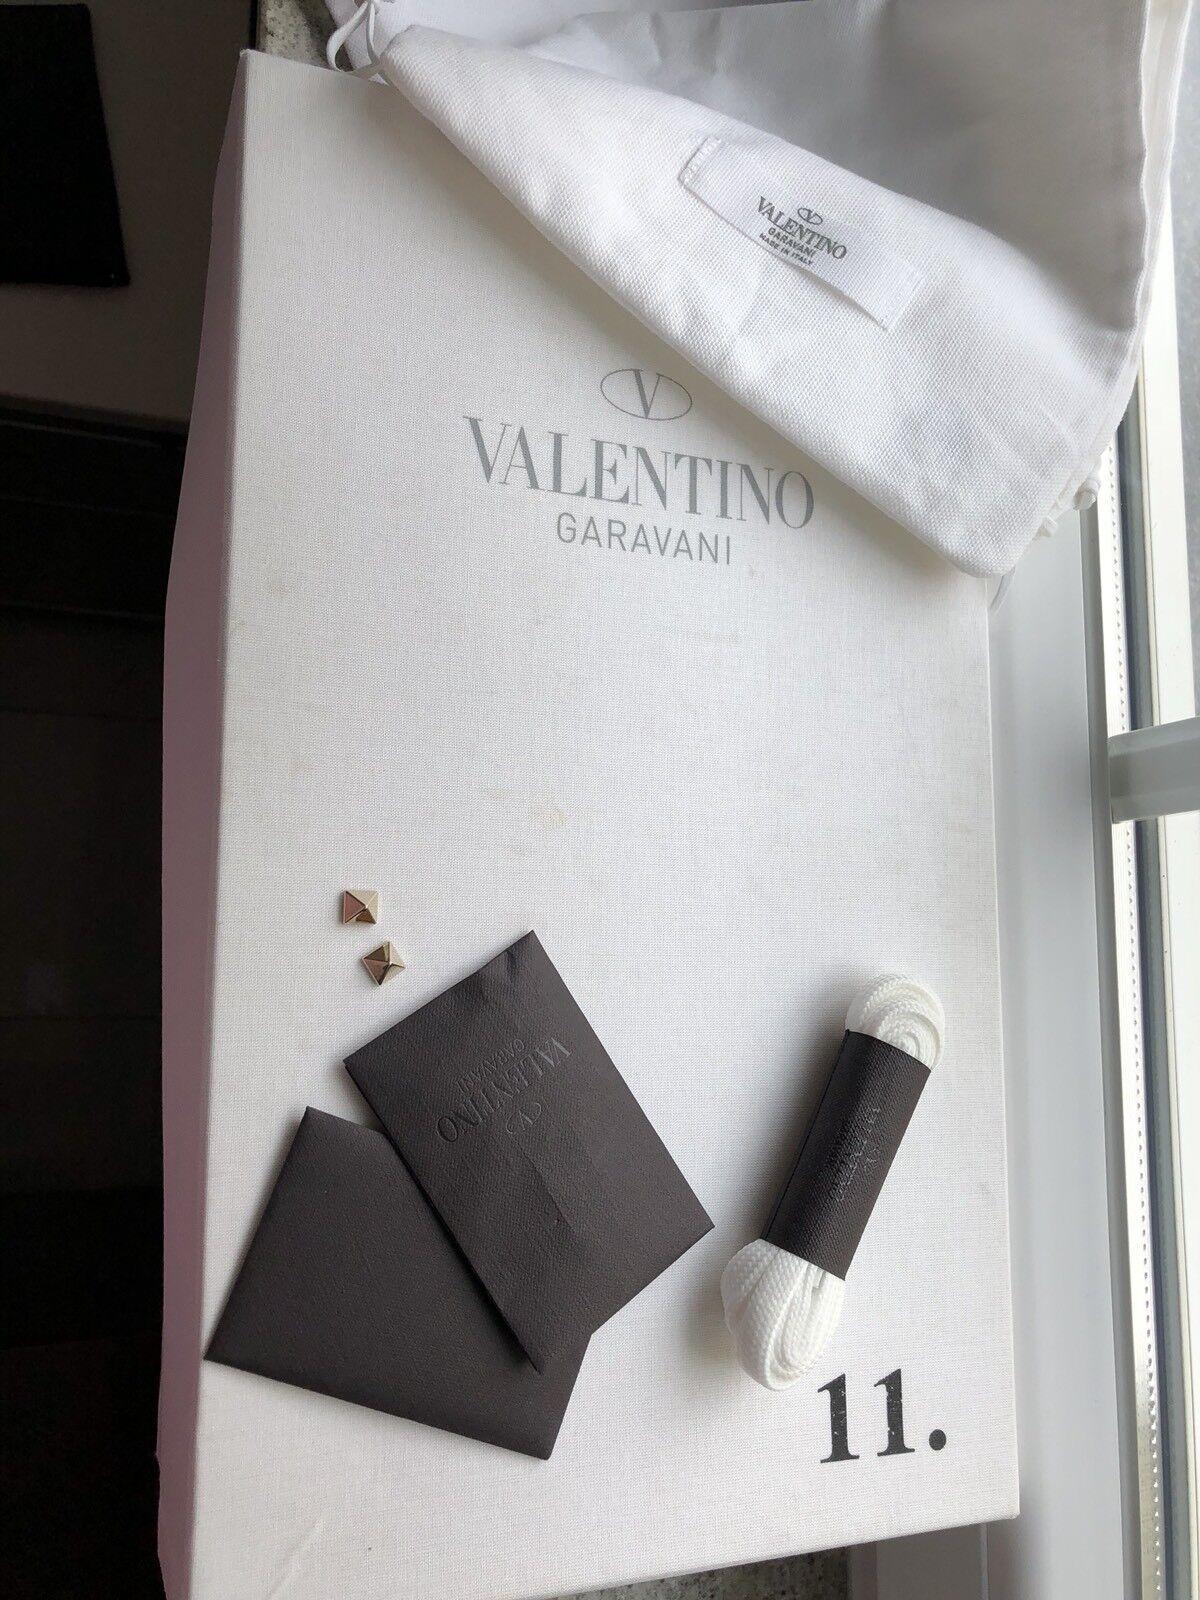 Original Valentino Box, Garavani Rockstud Box, Valentino Dustbag, Cards, Schuhelaces Etc. bf639e